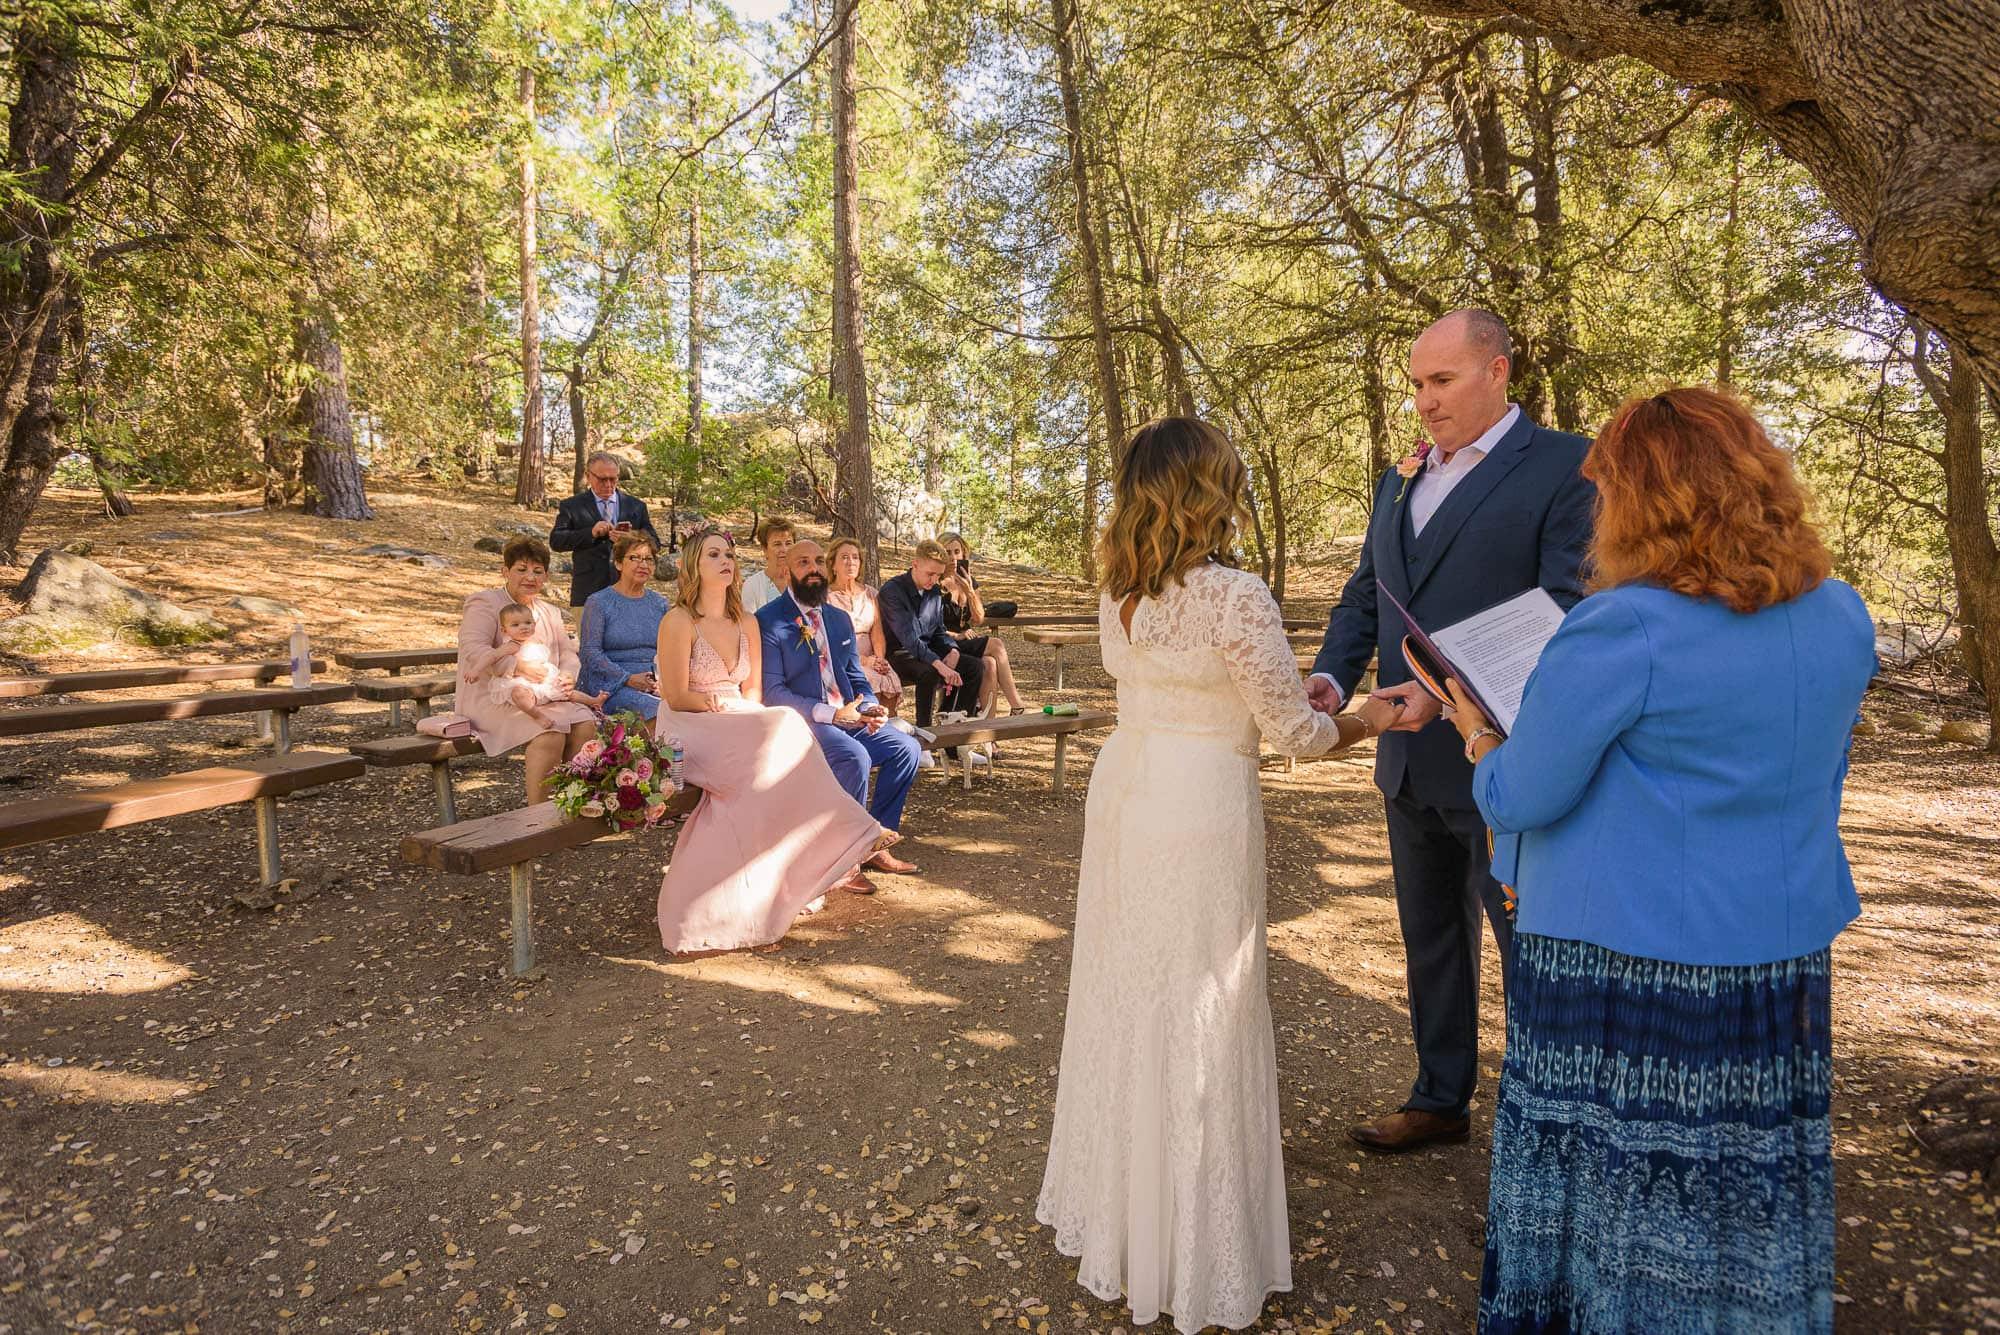 015_Alan_and_Heidi_Wedding_Jackie_Dannon